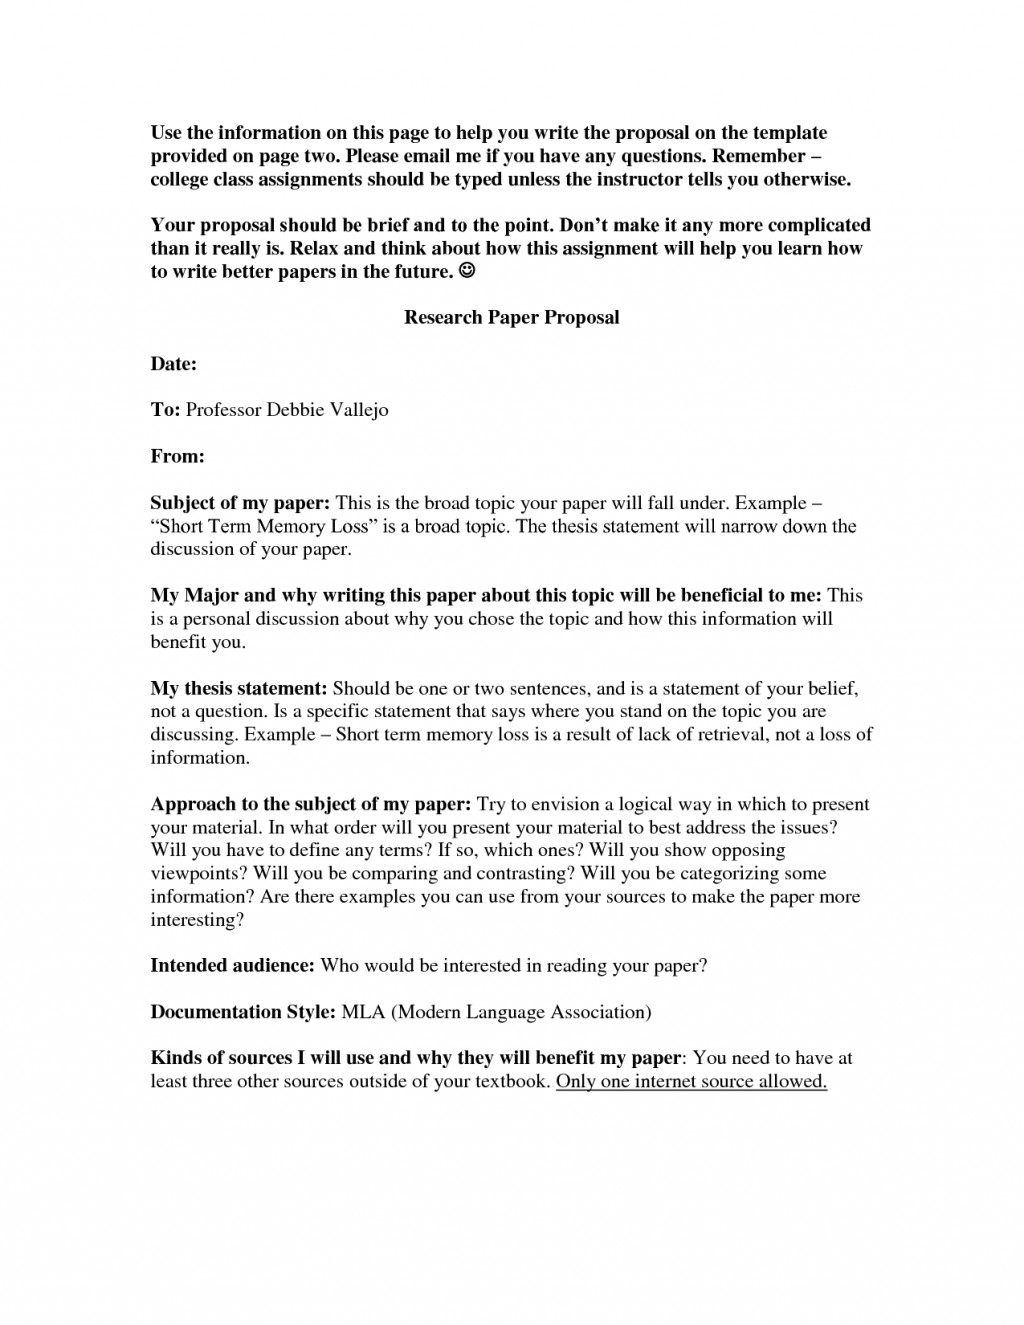 006 Essay Example Proposal Angel Beats 614610 Top Apa Format Samples Large